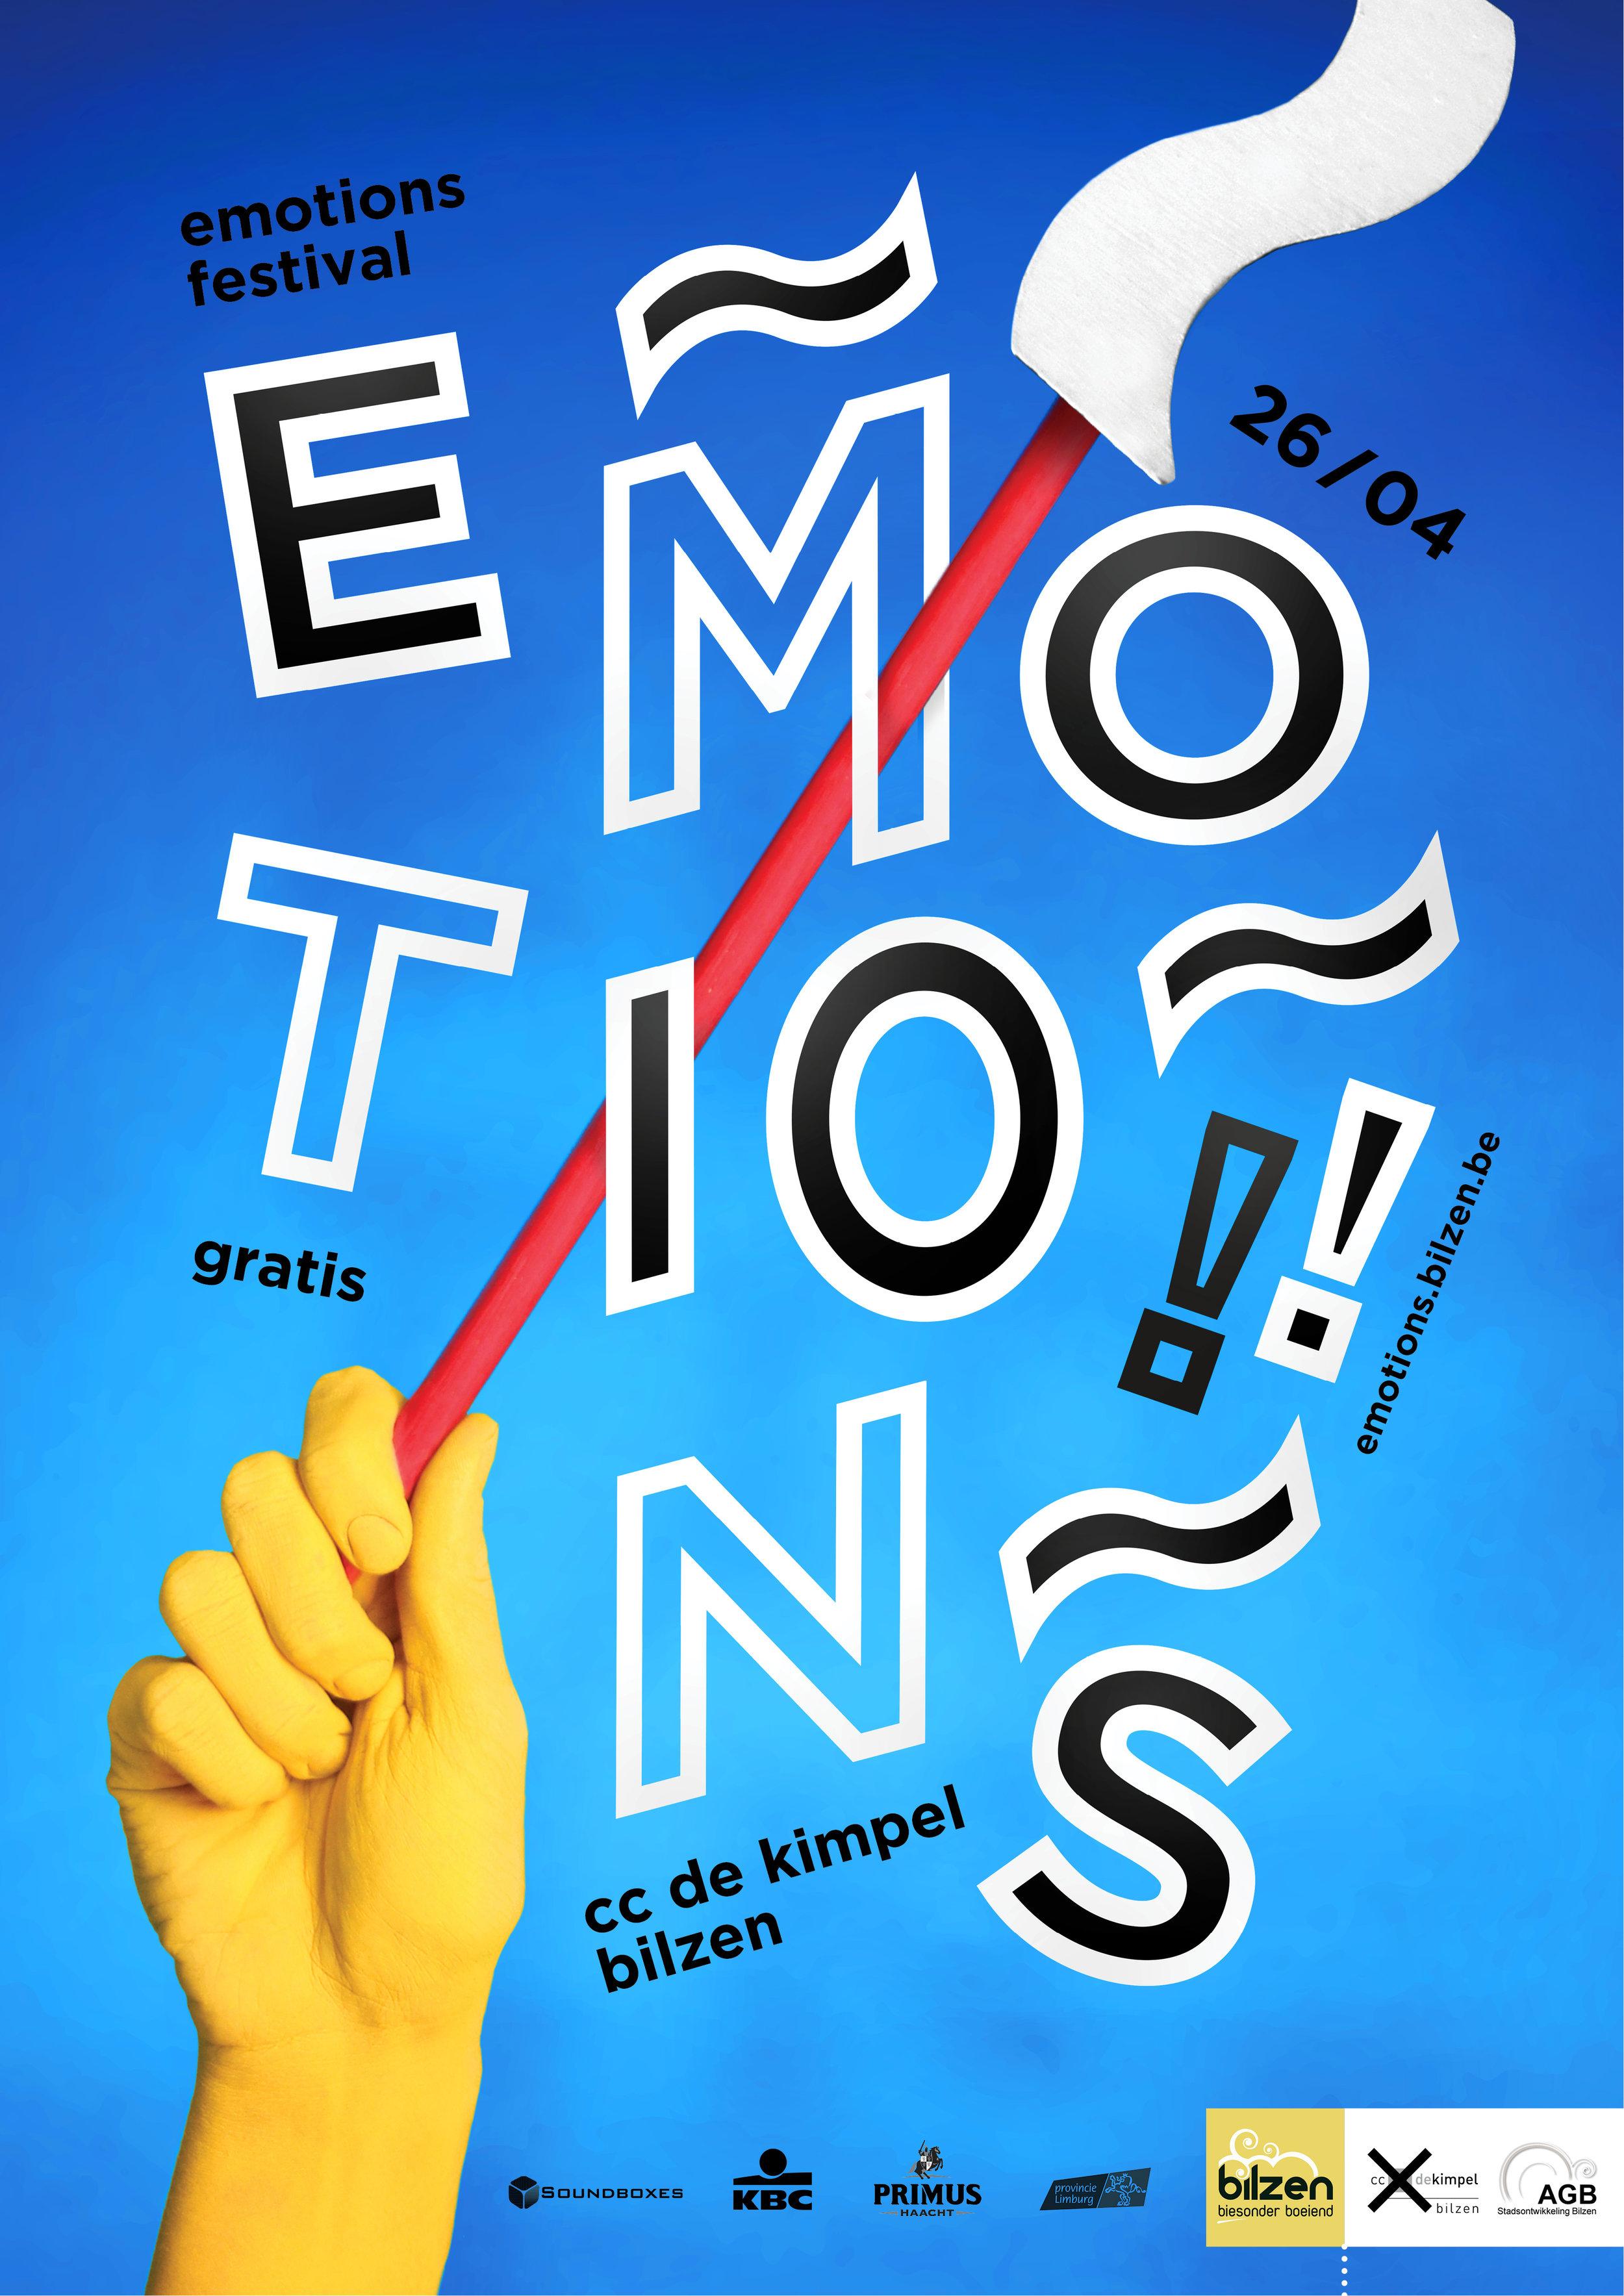 Emotions Festival 2014